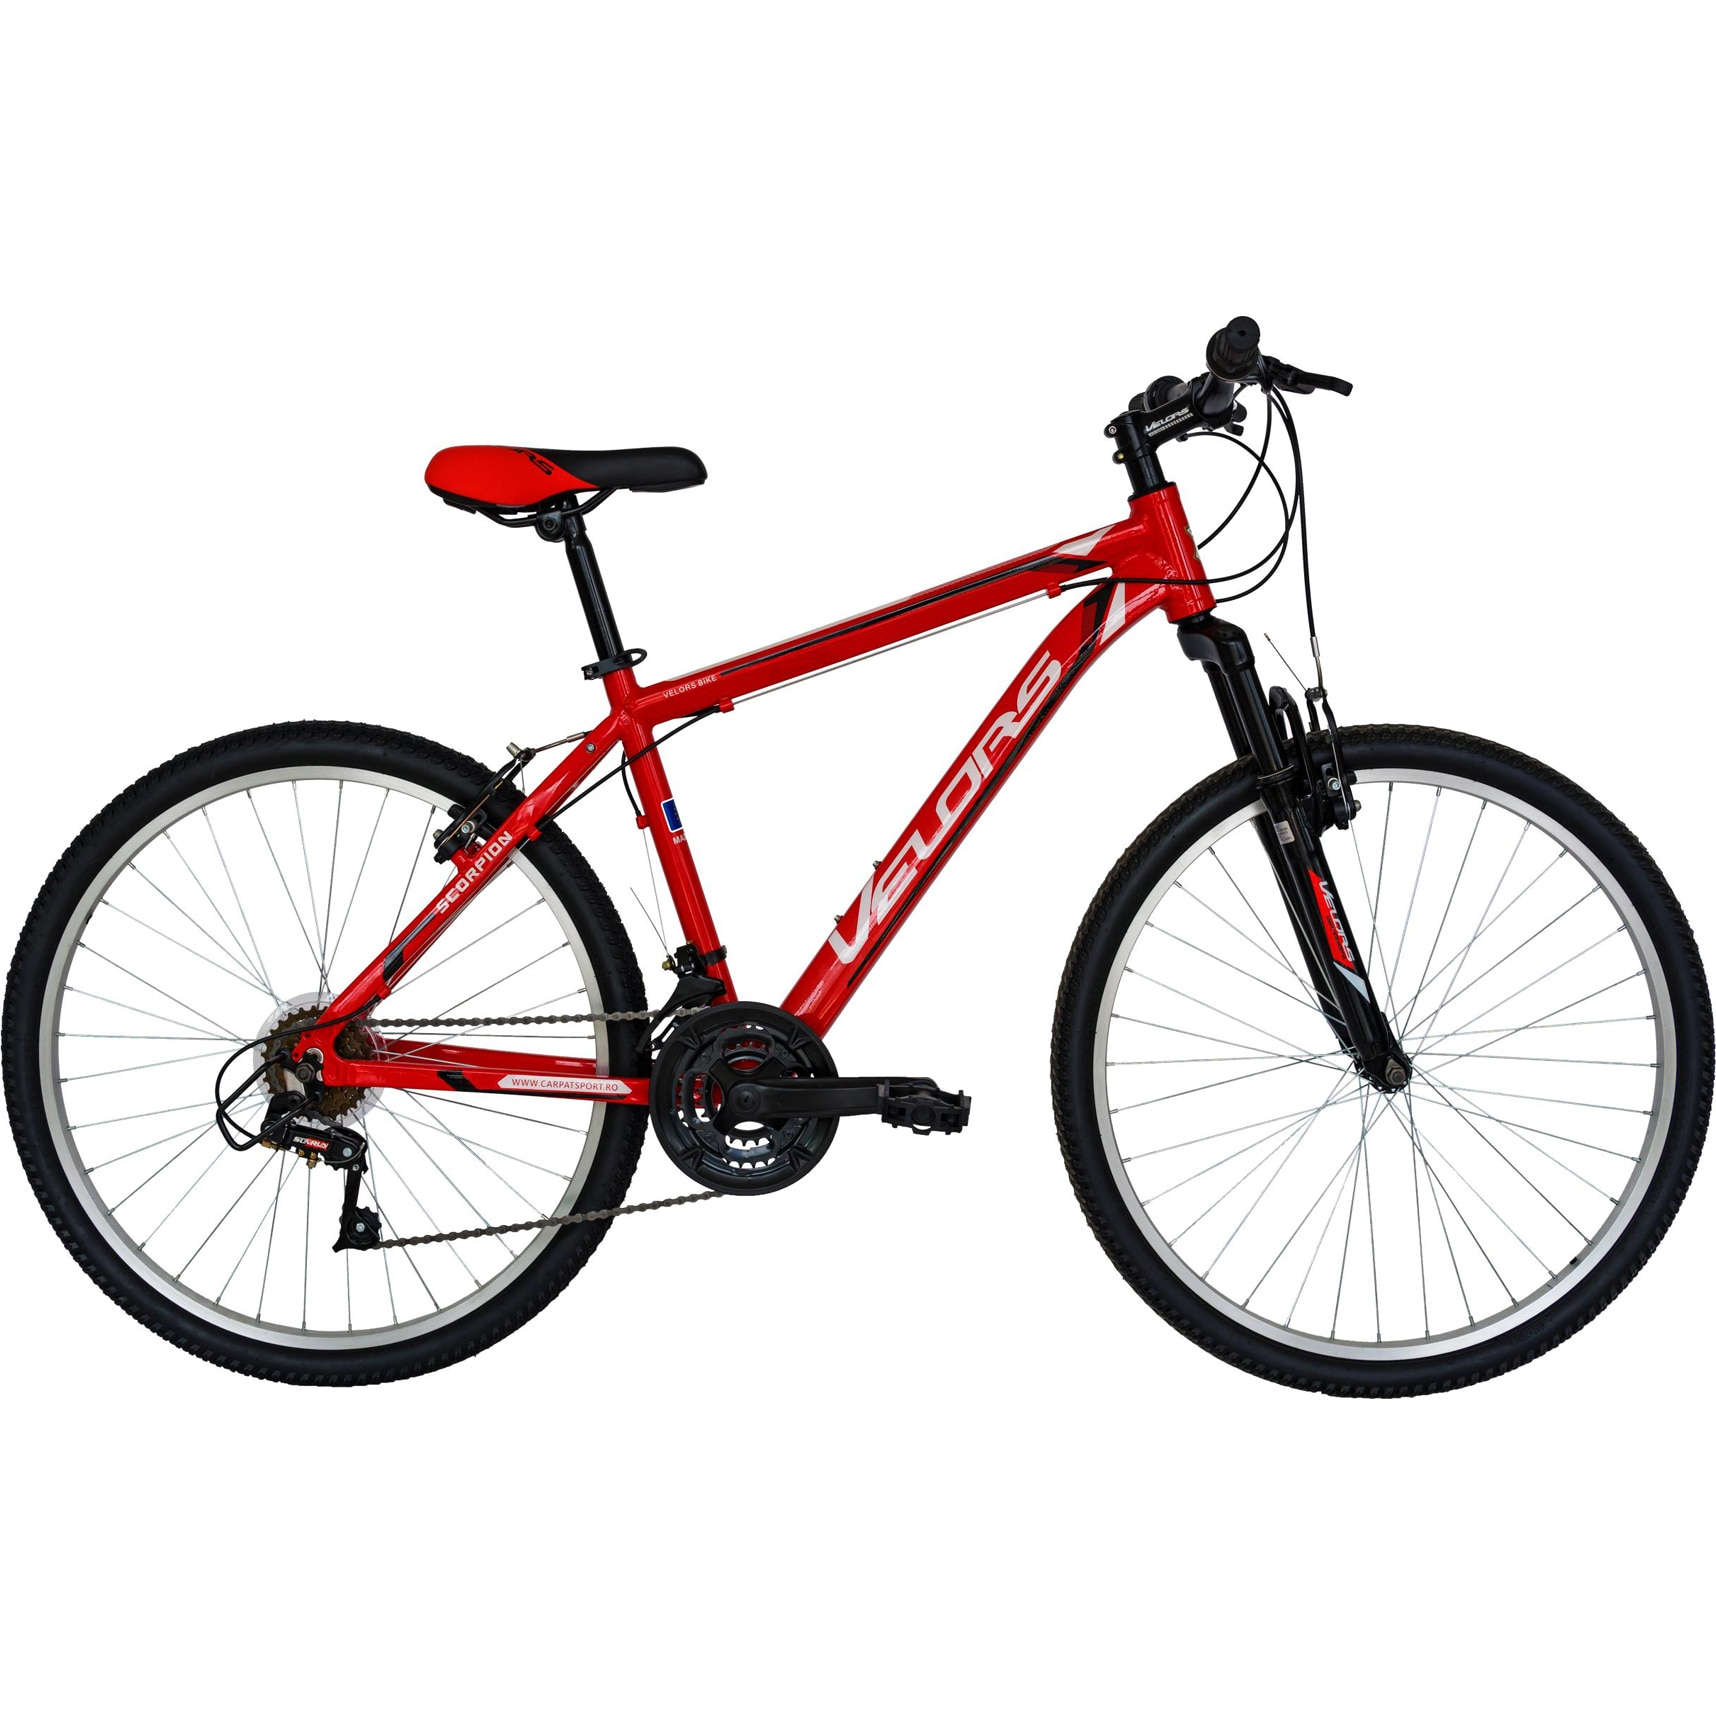 Fotografie Bicicleta de munte 26 inch Veolors V2671A, cadru hardtail aluminiu, sistem de franare V-Brake, 18 viteze, Rosu/Alb